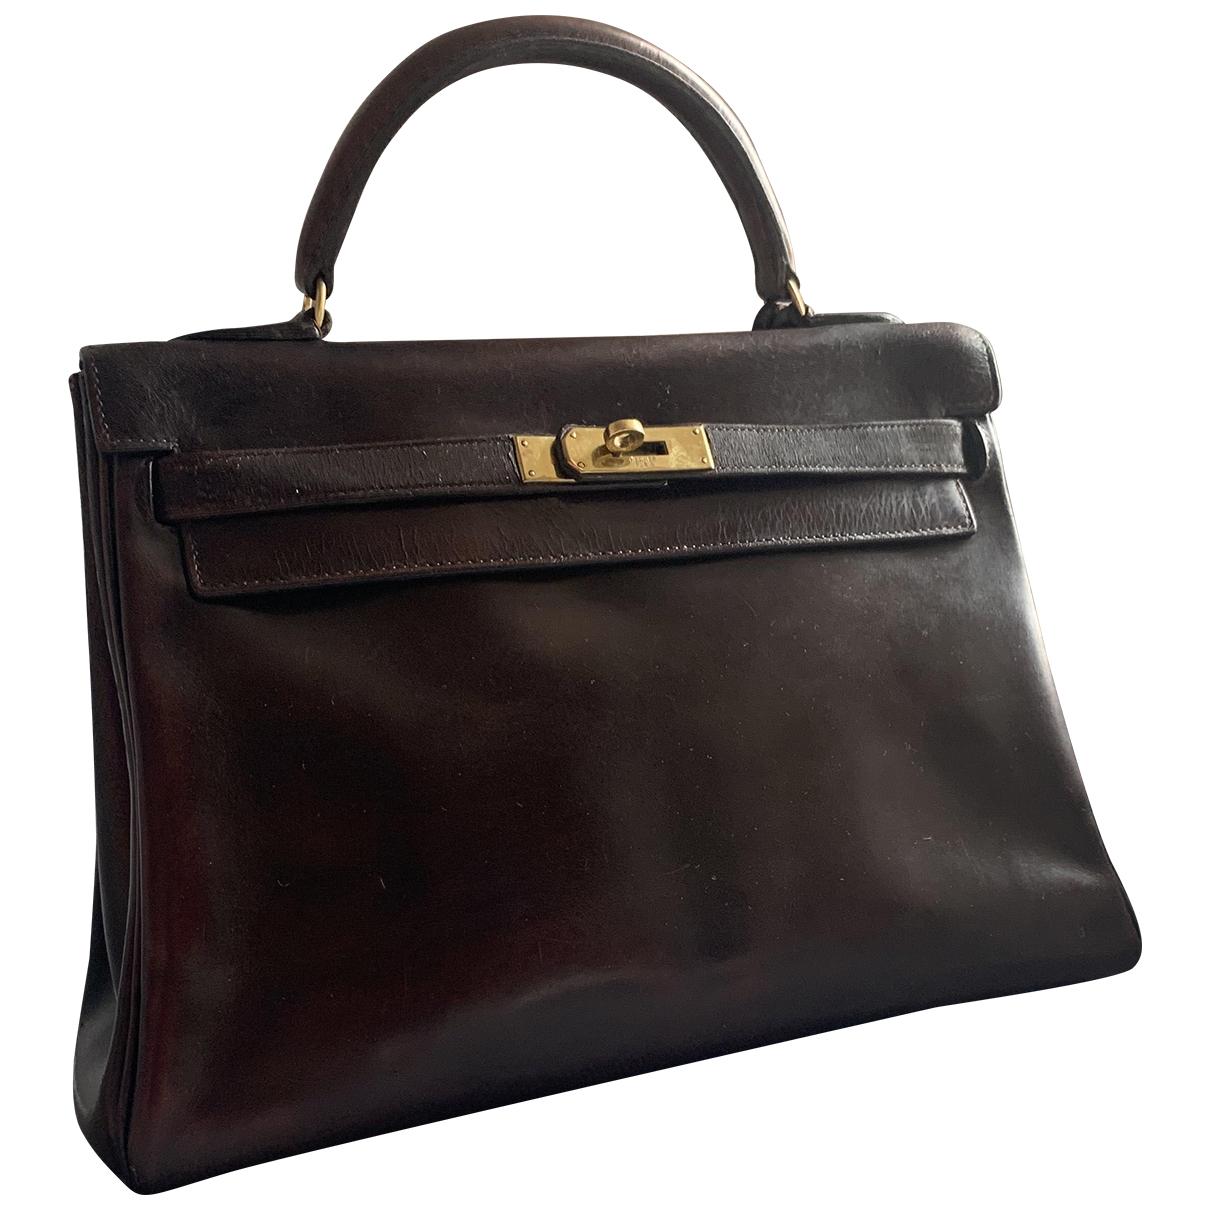 Hermès Kelly 32 Brown Leather handbag for Women N